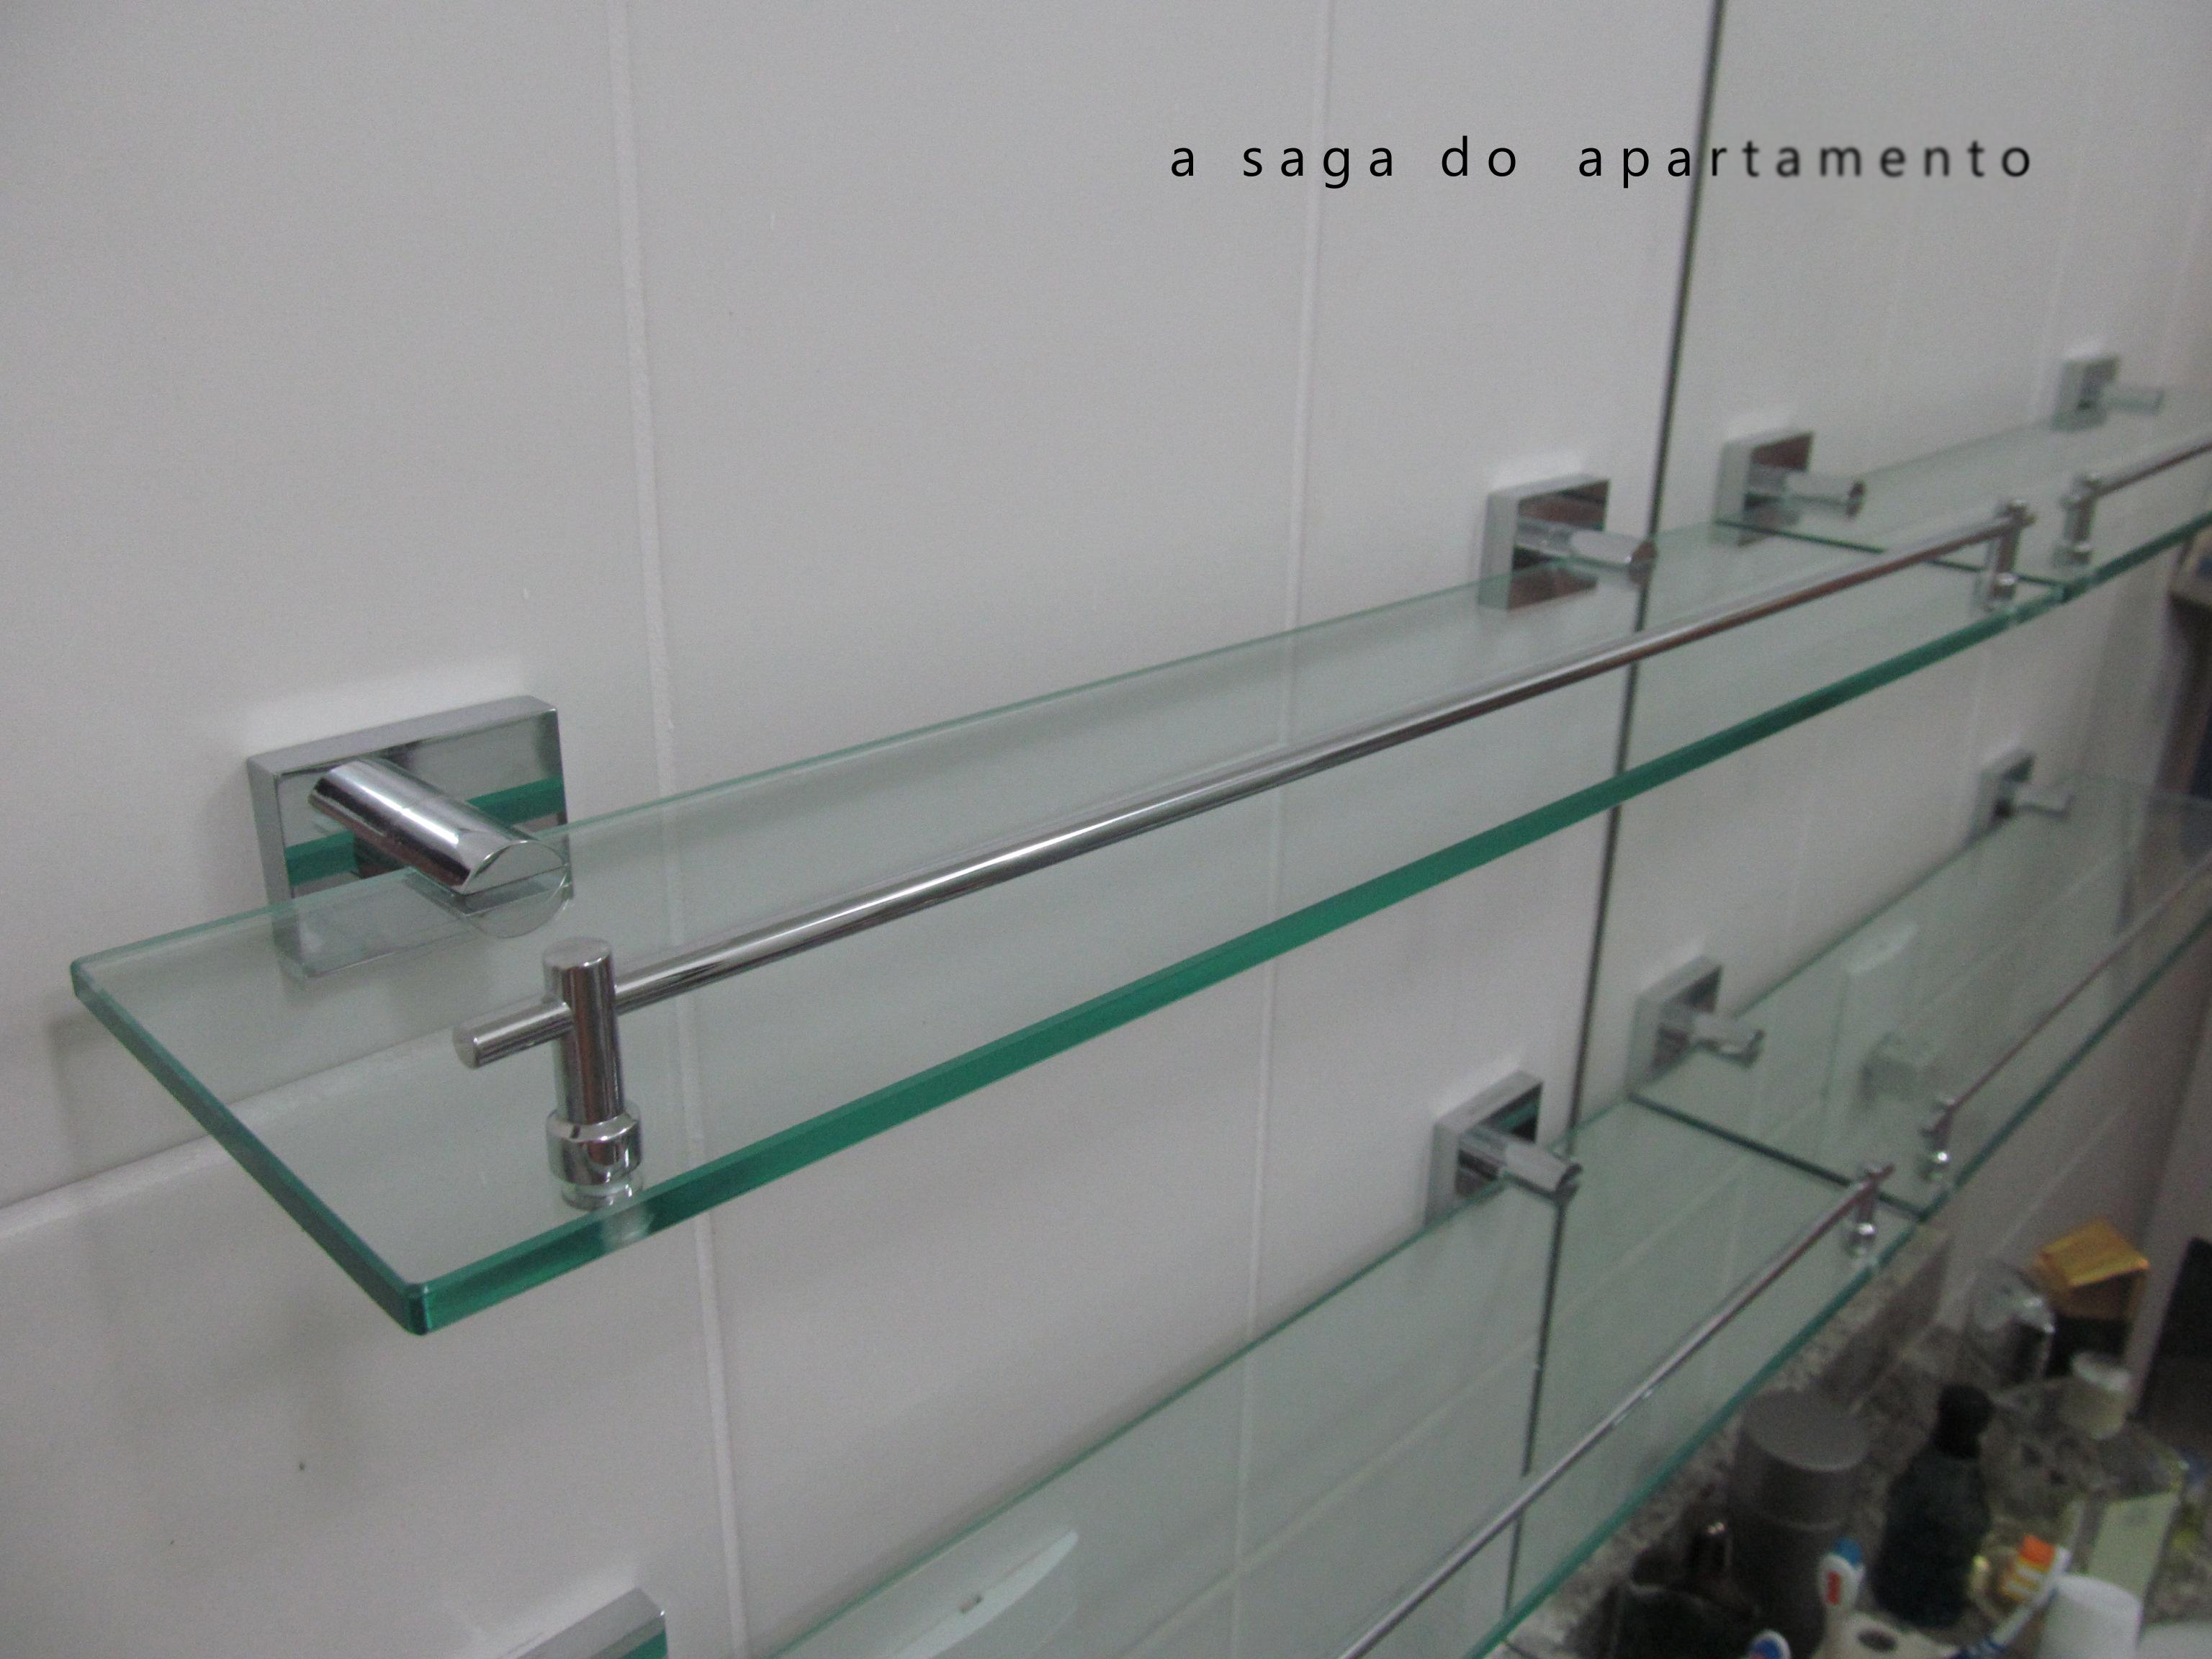 prateleira de vidro com inox moldenox #355A4F 3072x2304